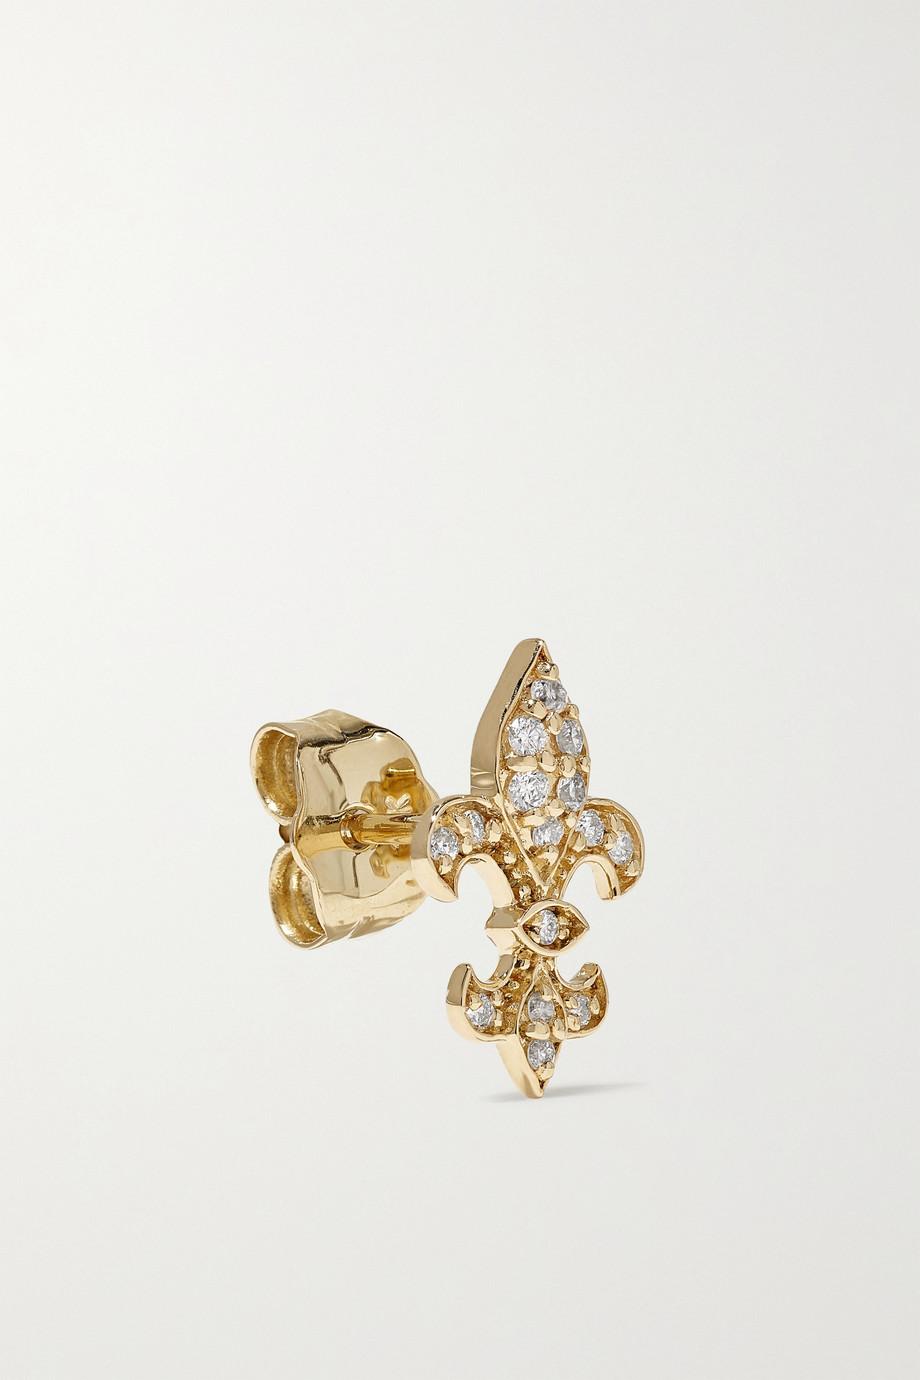 Sydney Evan Fleur de Lis 14-karat gold diamond earrings